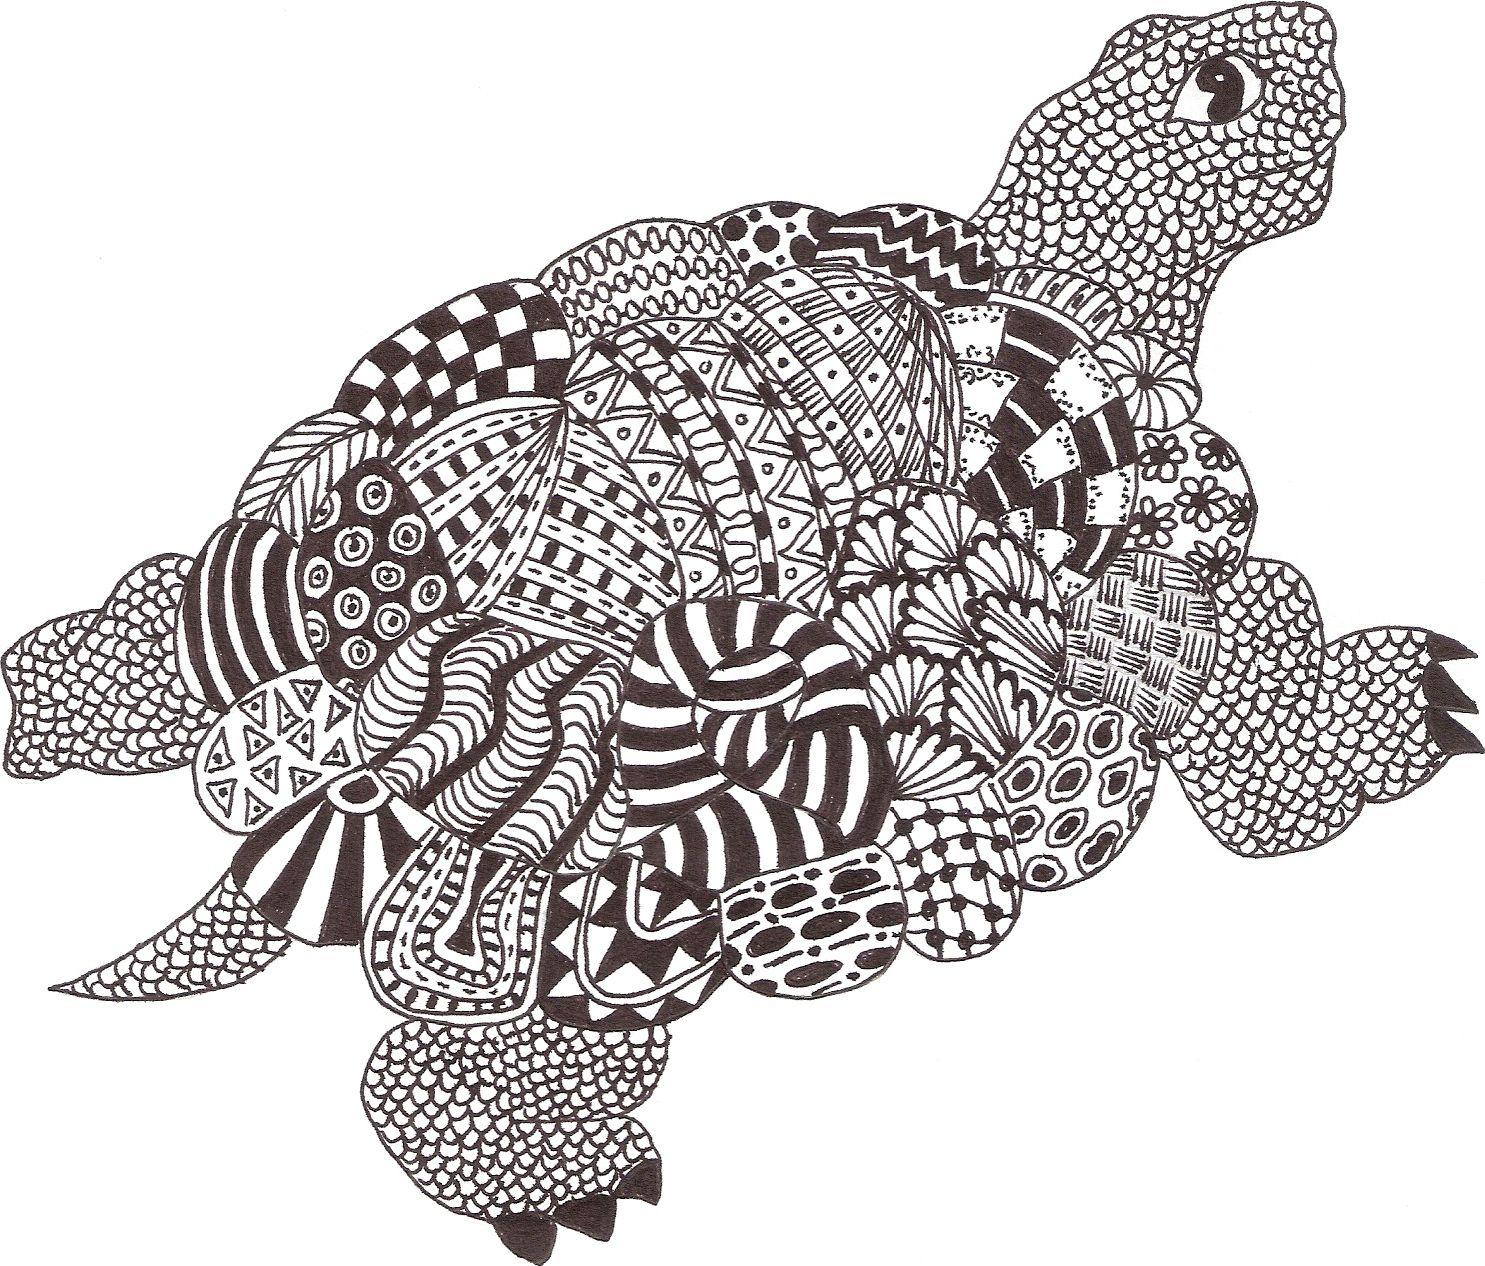 Zentangle Made By Mariska Den Boer 06